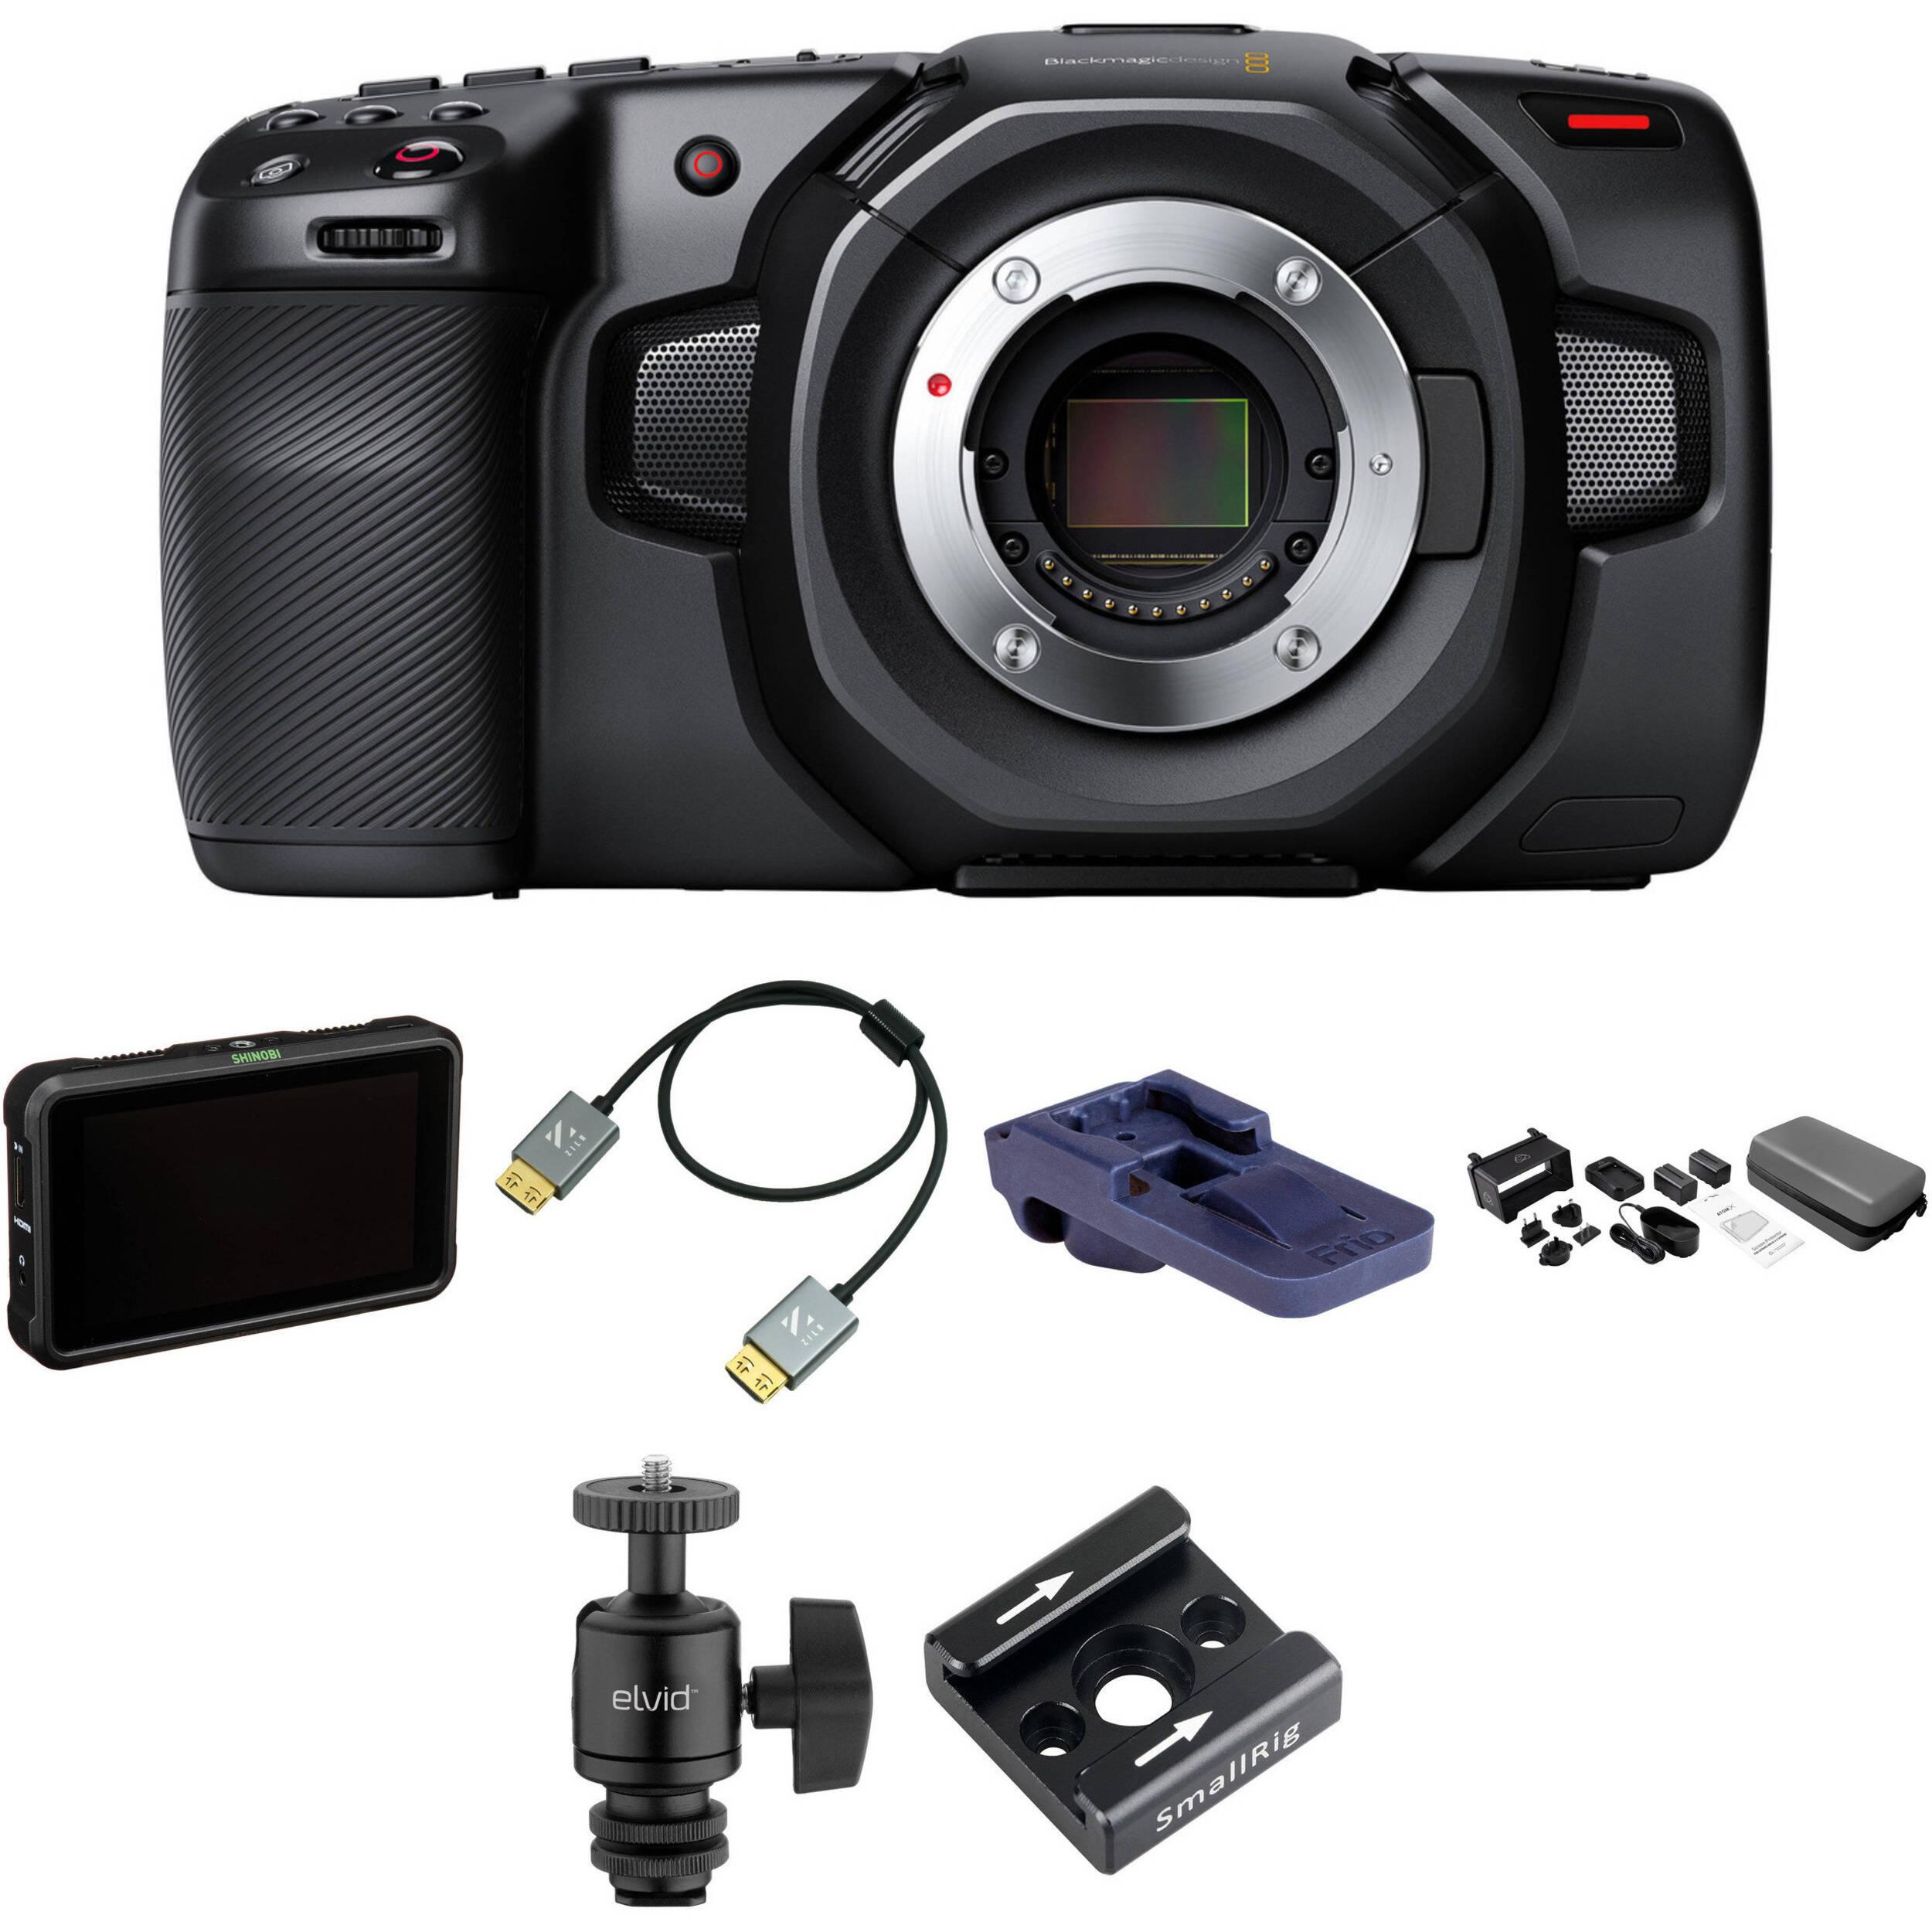 Blackmagic Design Pocket Cinema Camera 4k Pro Monitoring Kit